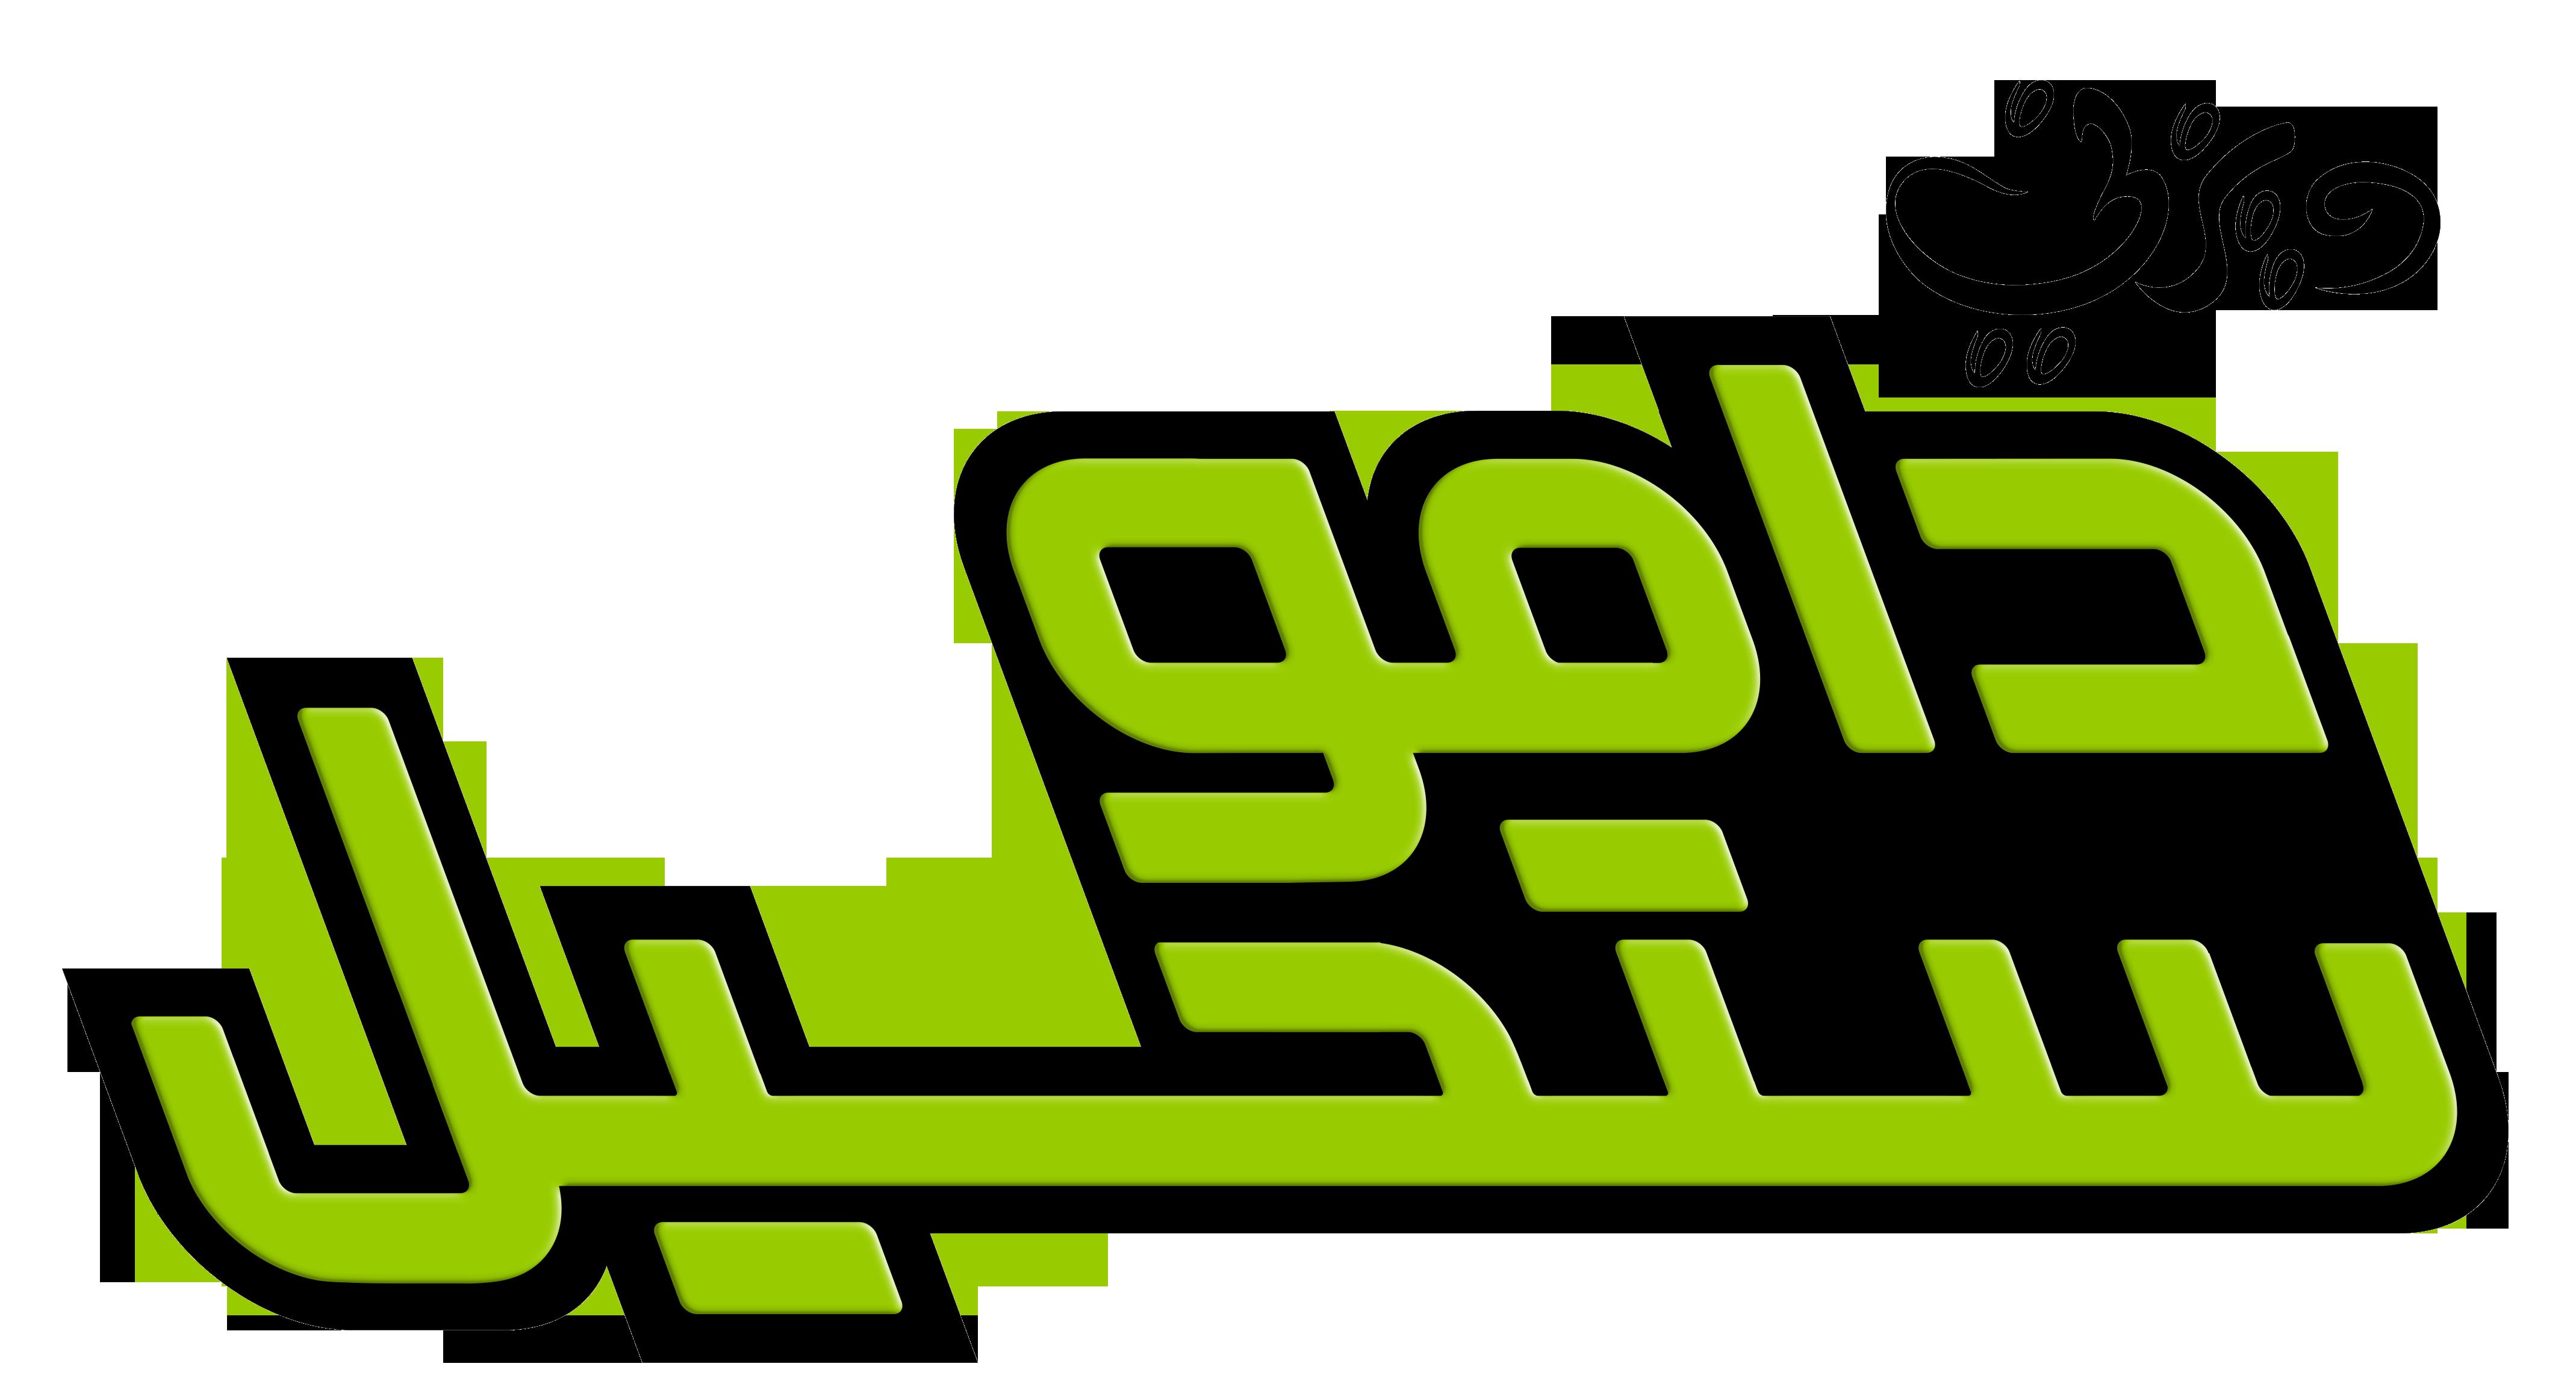 Walt Disney Logos - Kim Possible (Arabic Version)